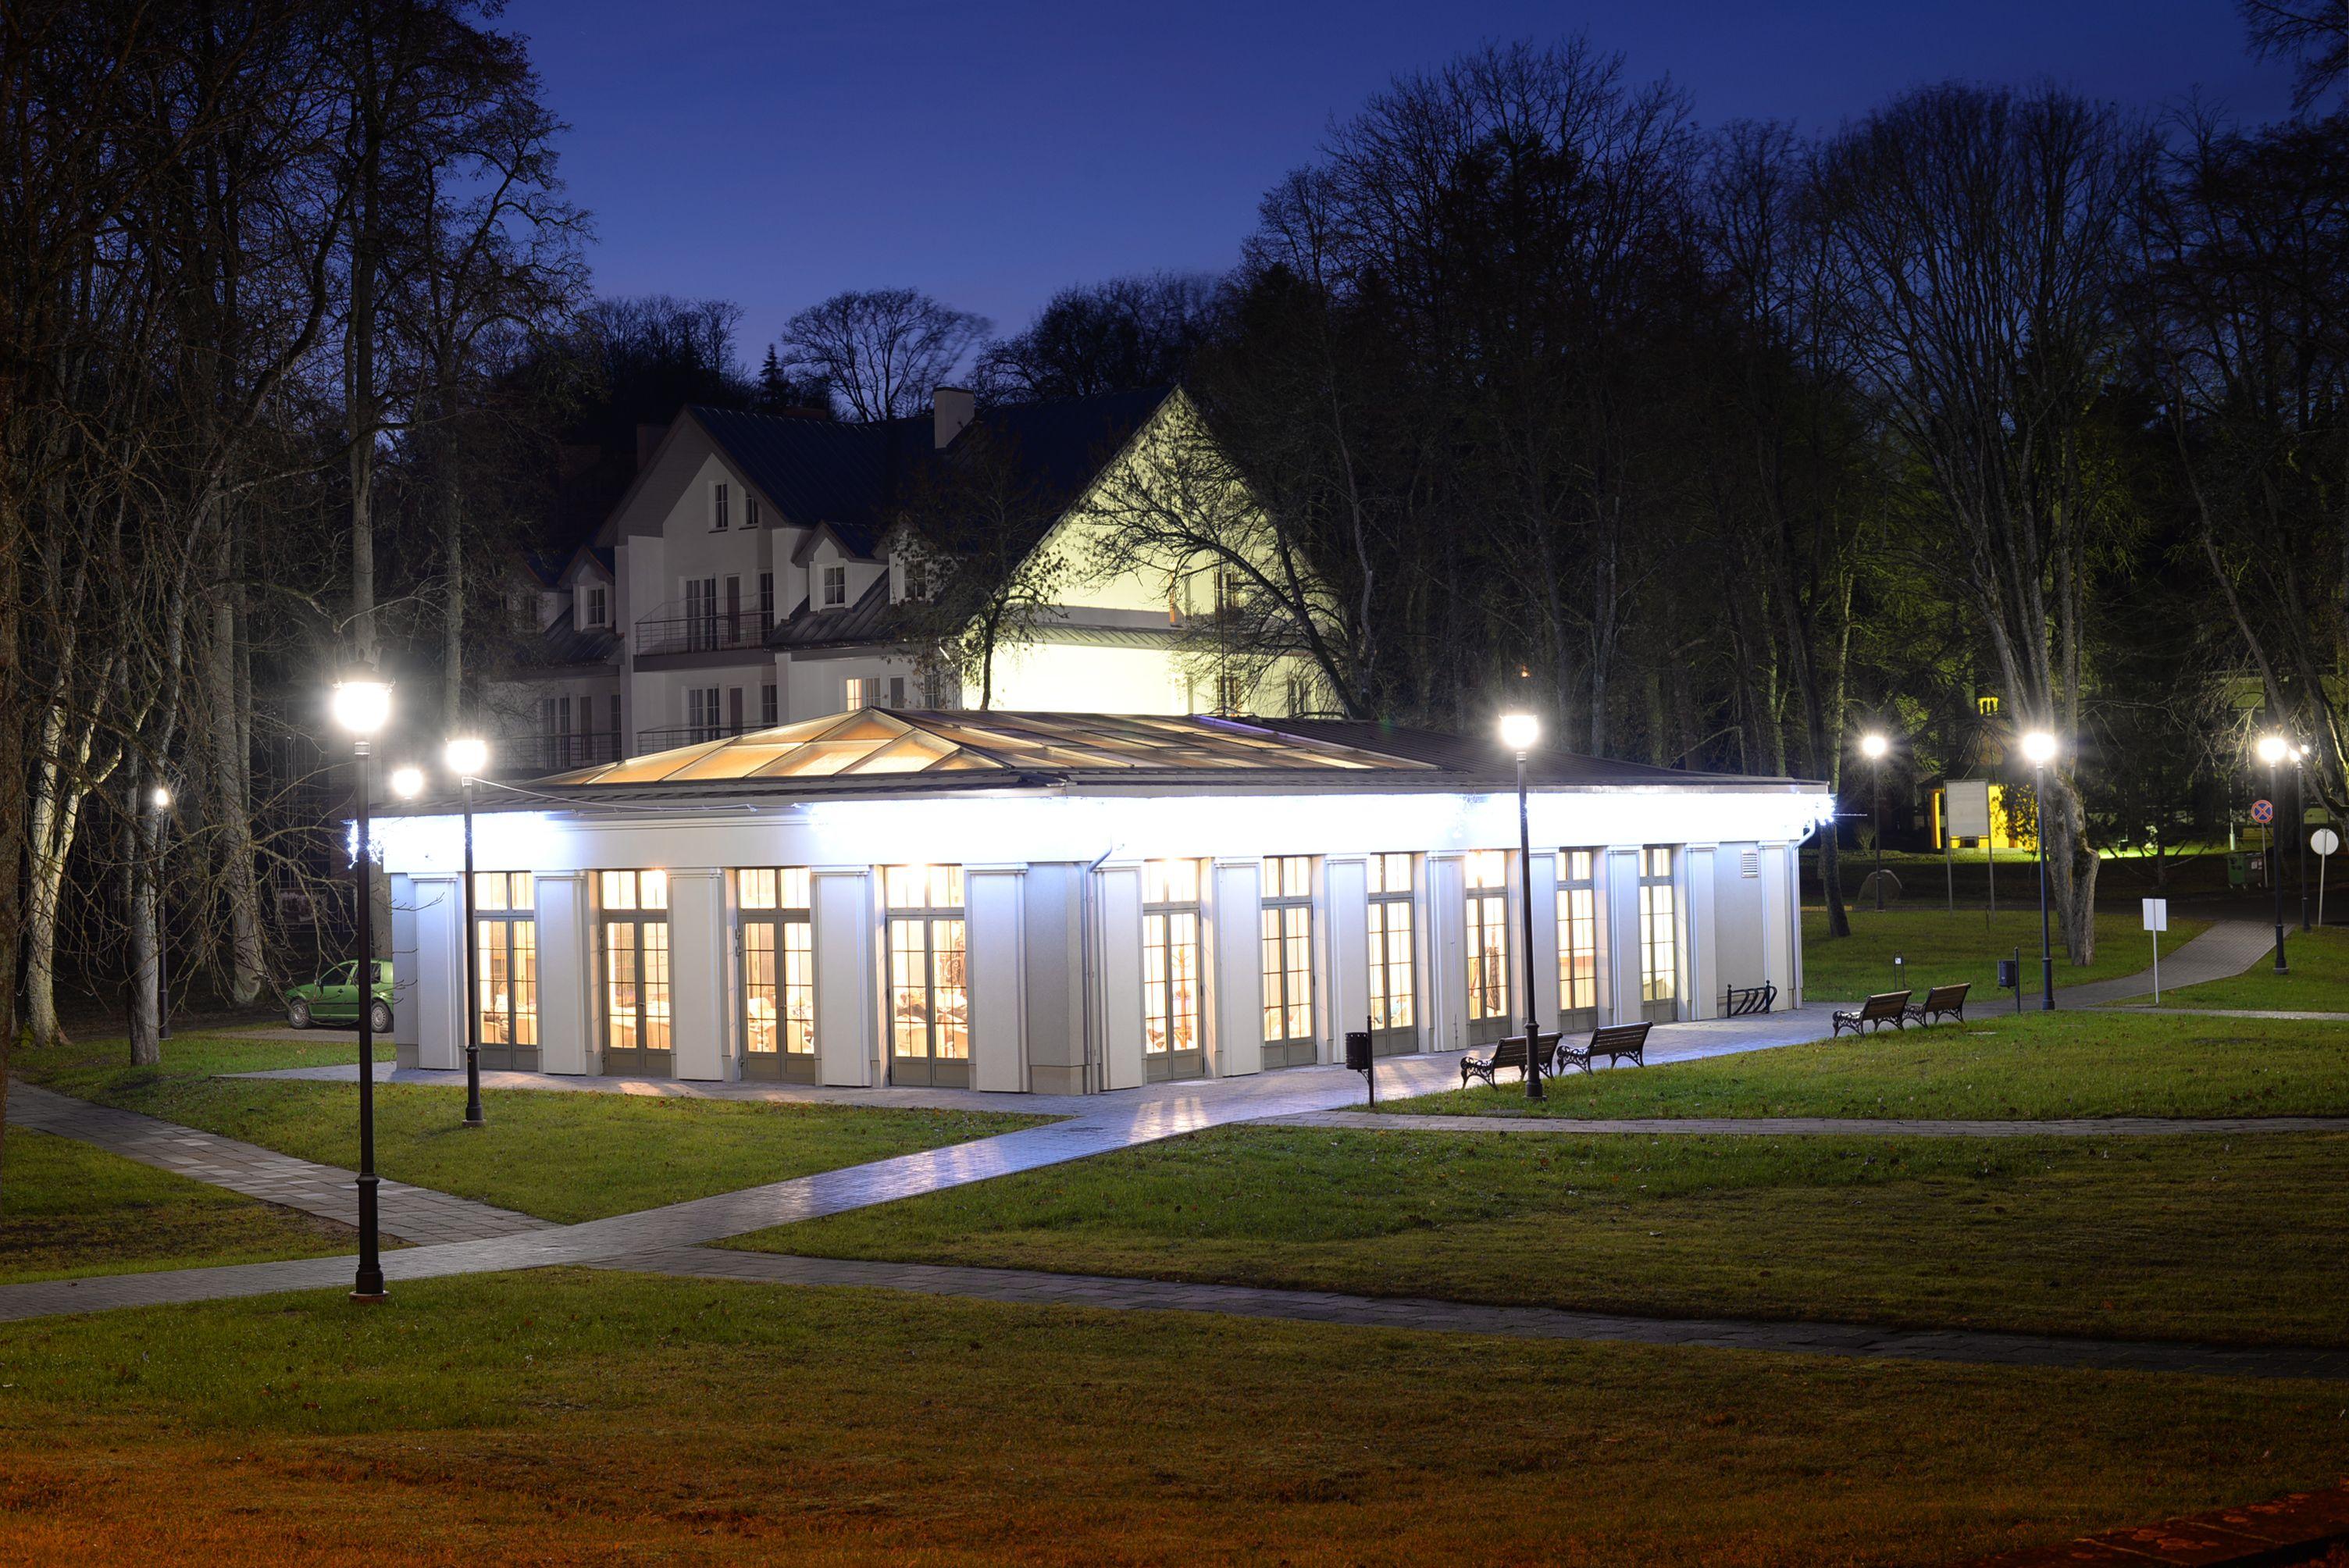 "Mineralinio vandens paviljonas ""Birutės vila"" Birštone // Mineral water pavilion in Birstonas ""Birutes villa"""